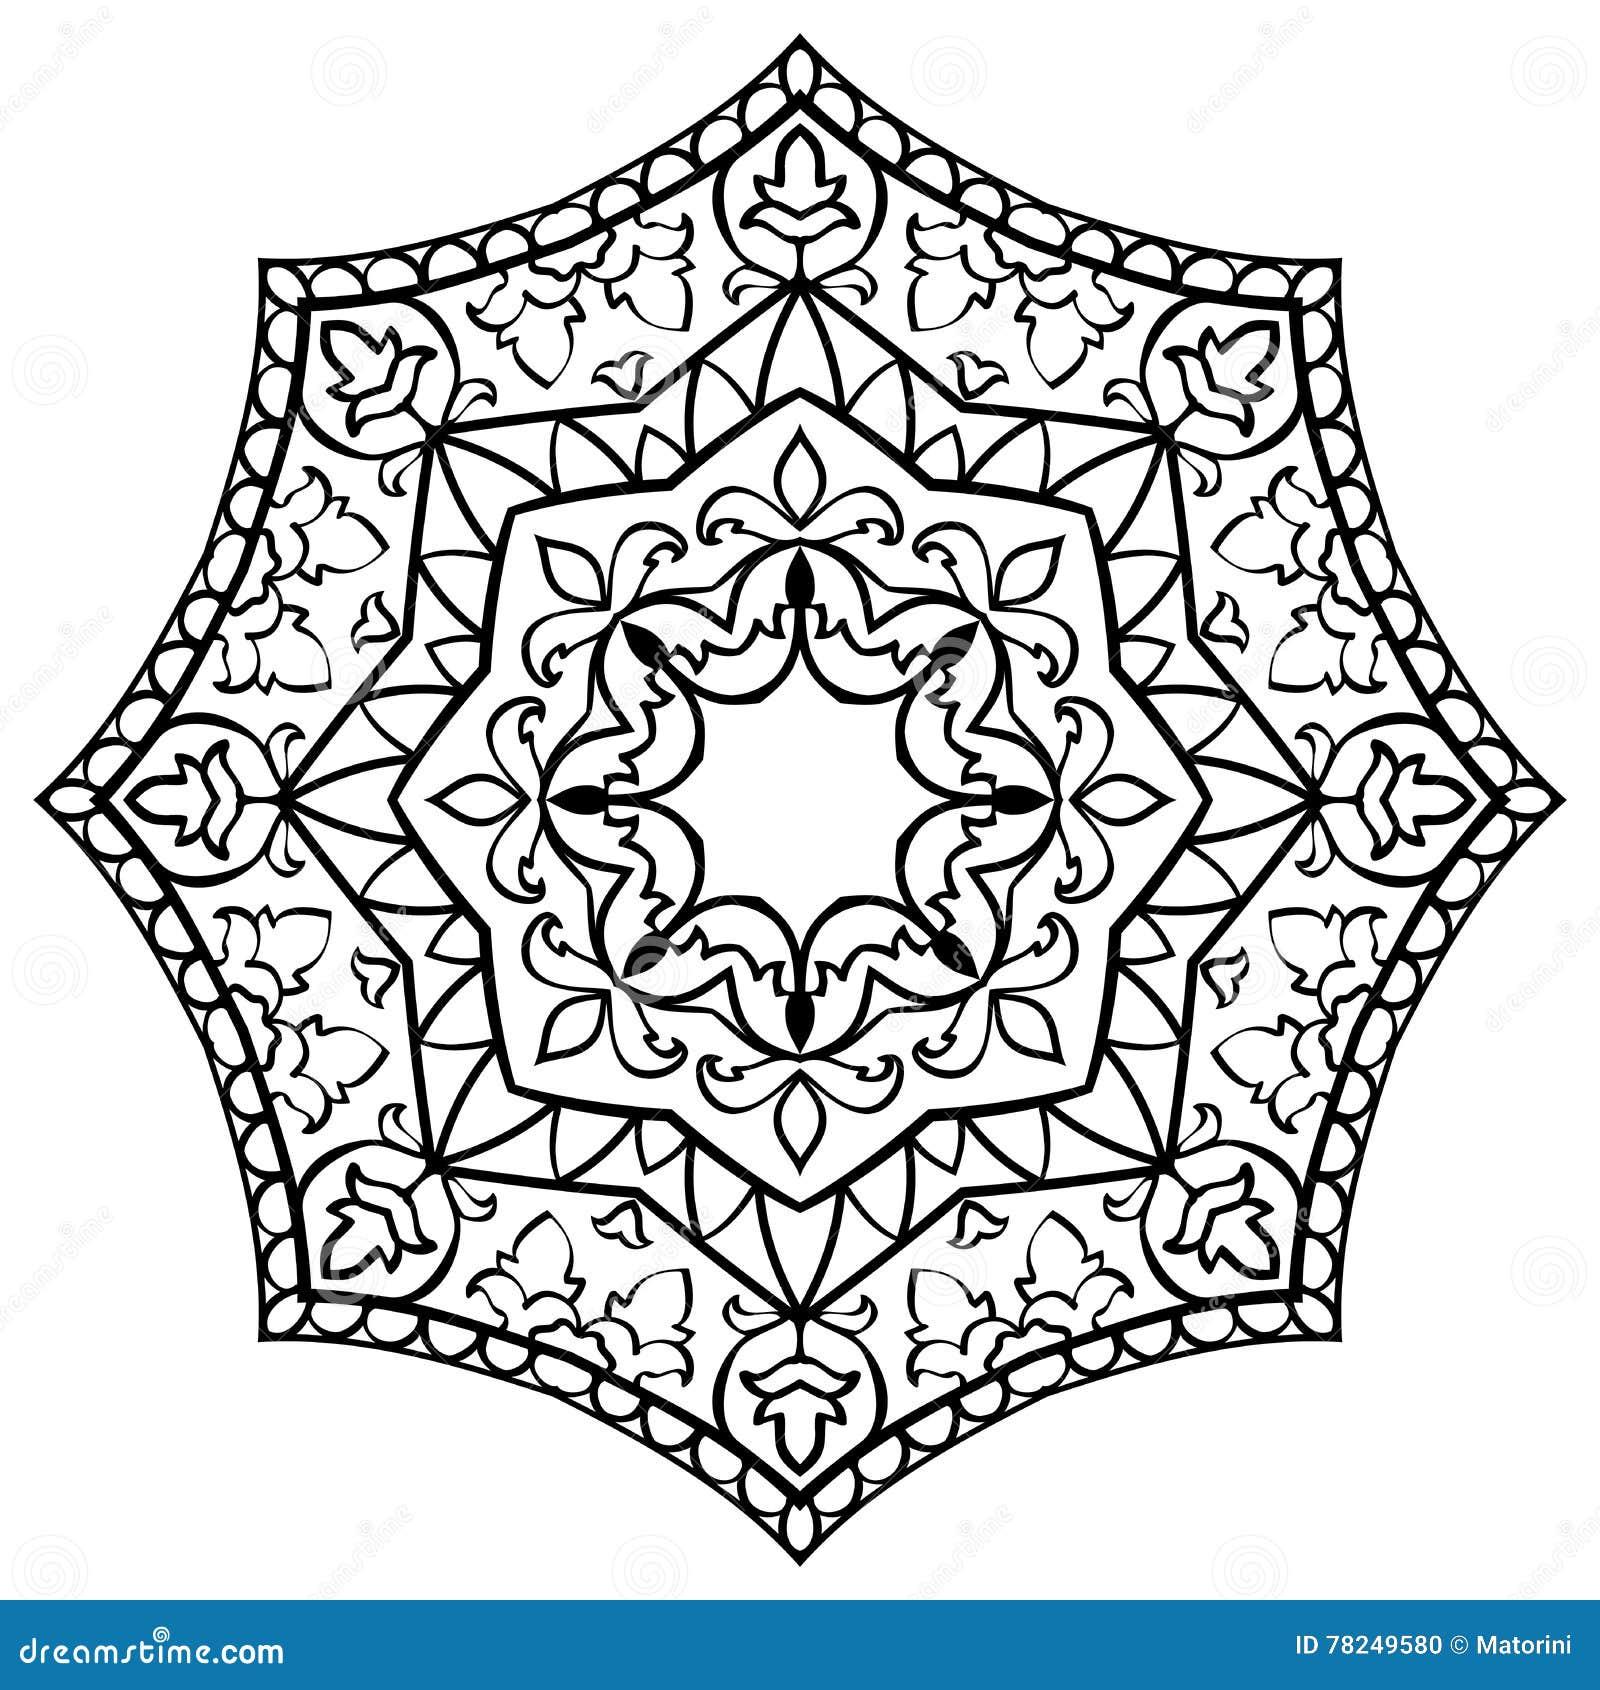 Simple Carpet Design Drawing - Carpet Vidalondon